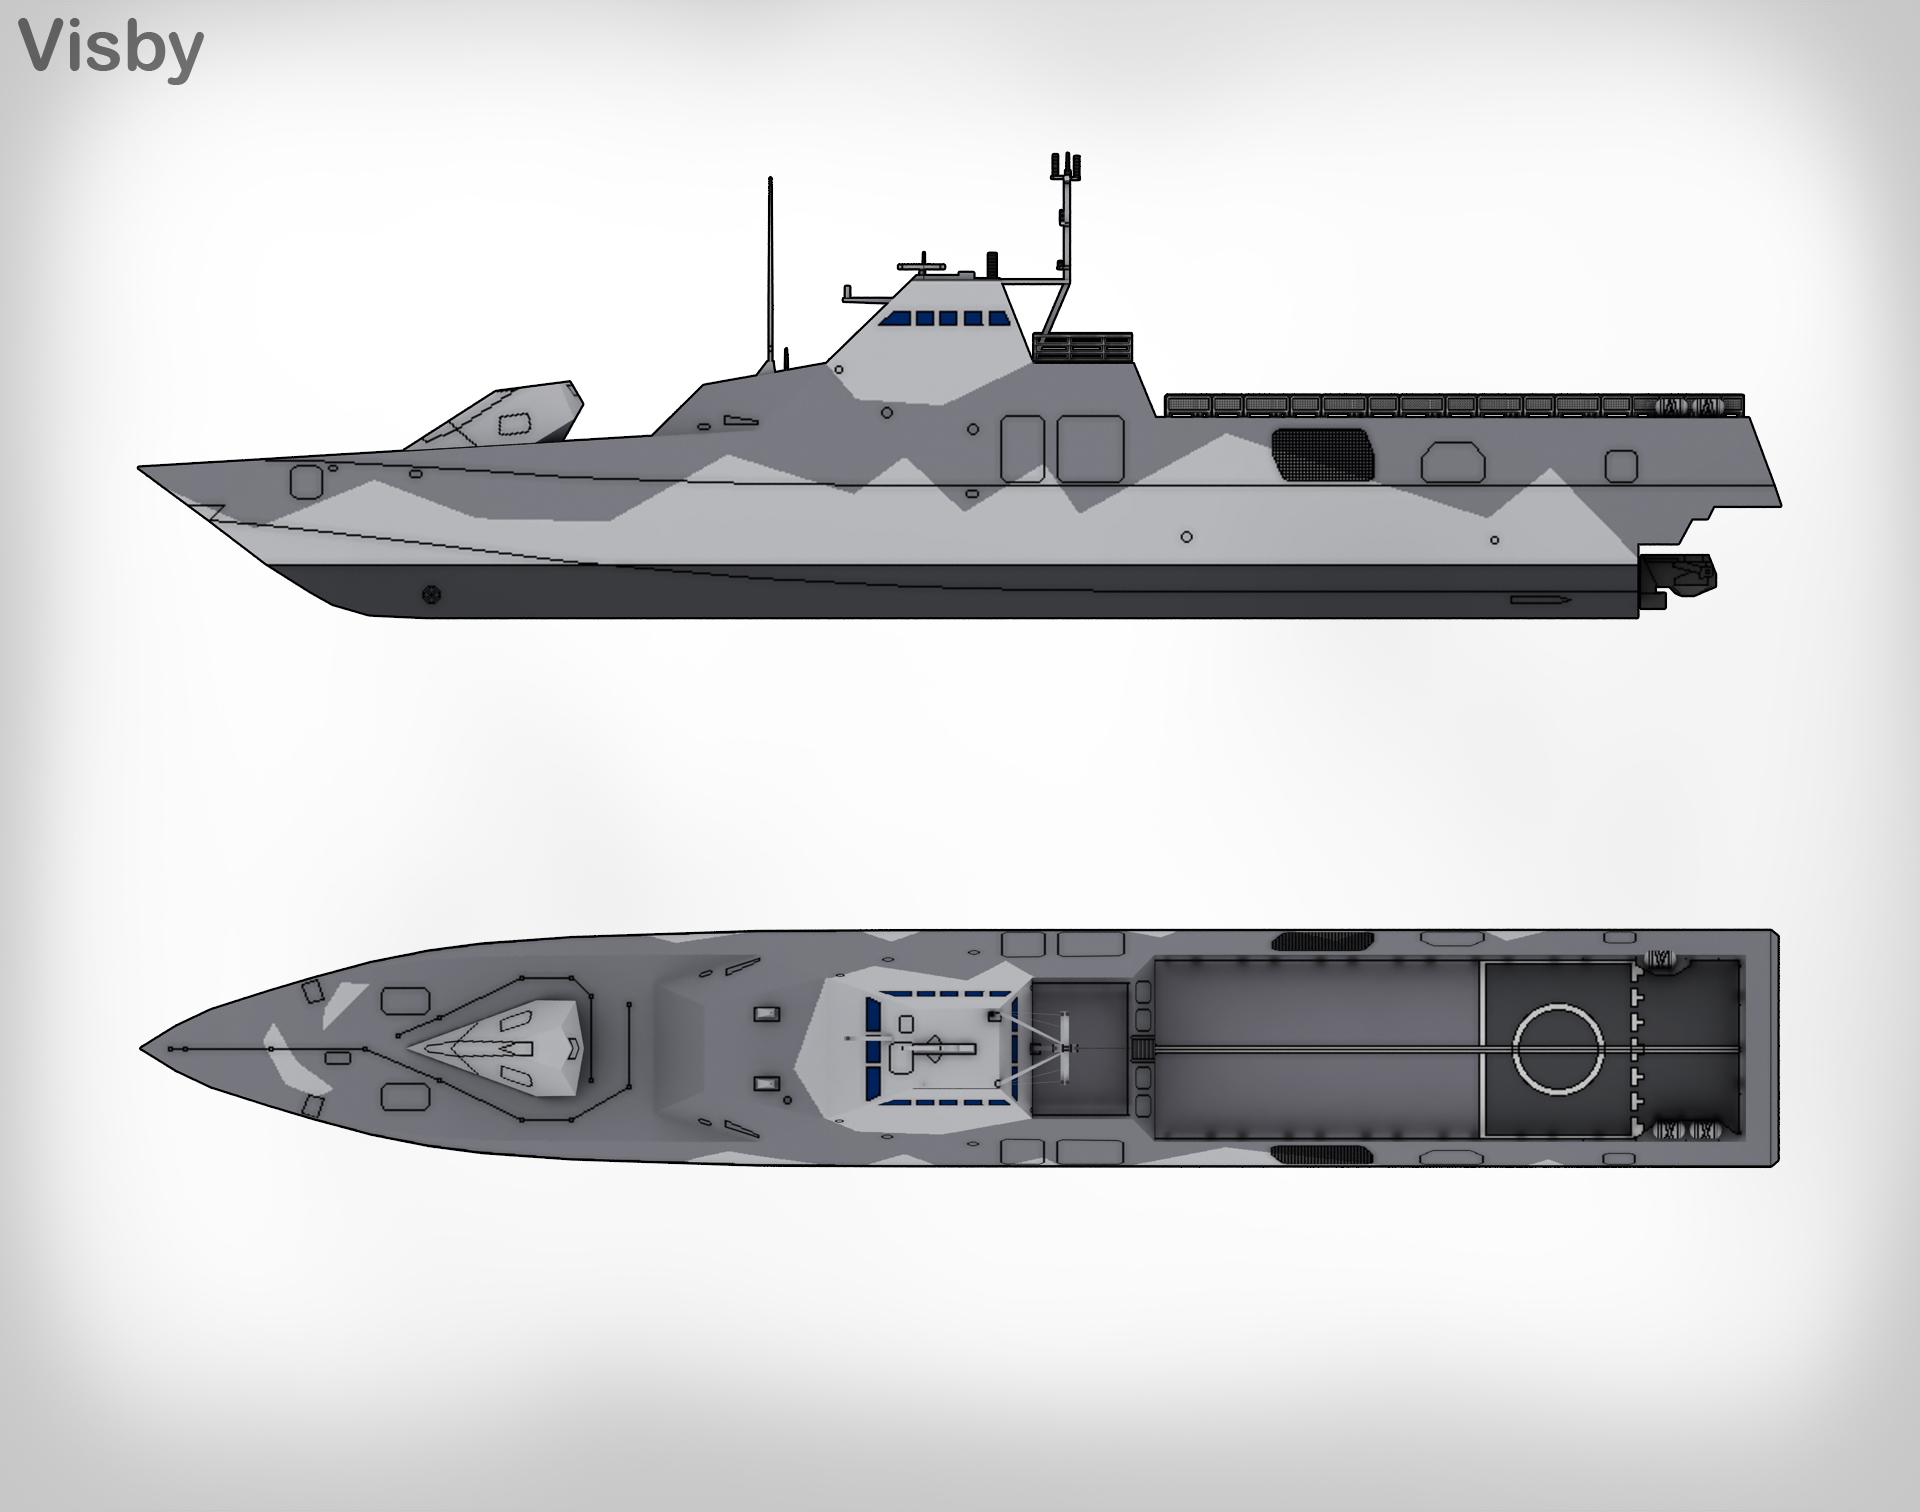 escort visby göteborg design